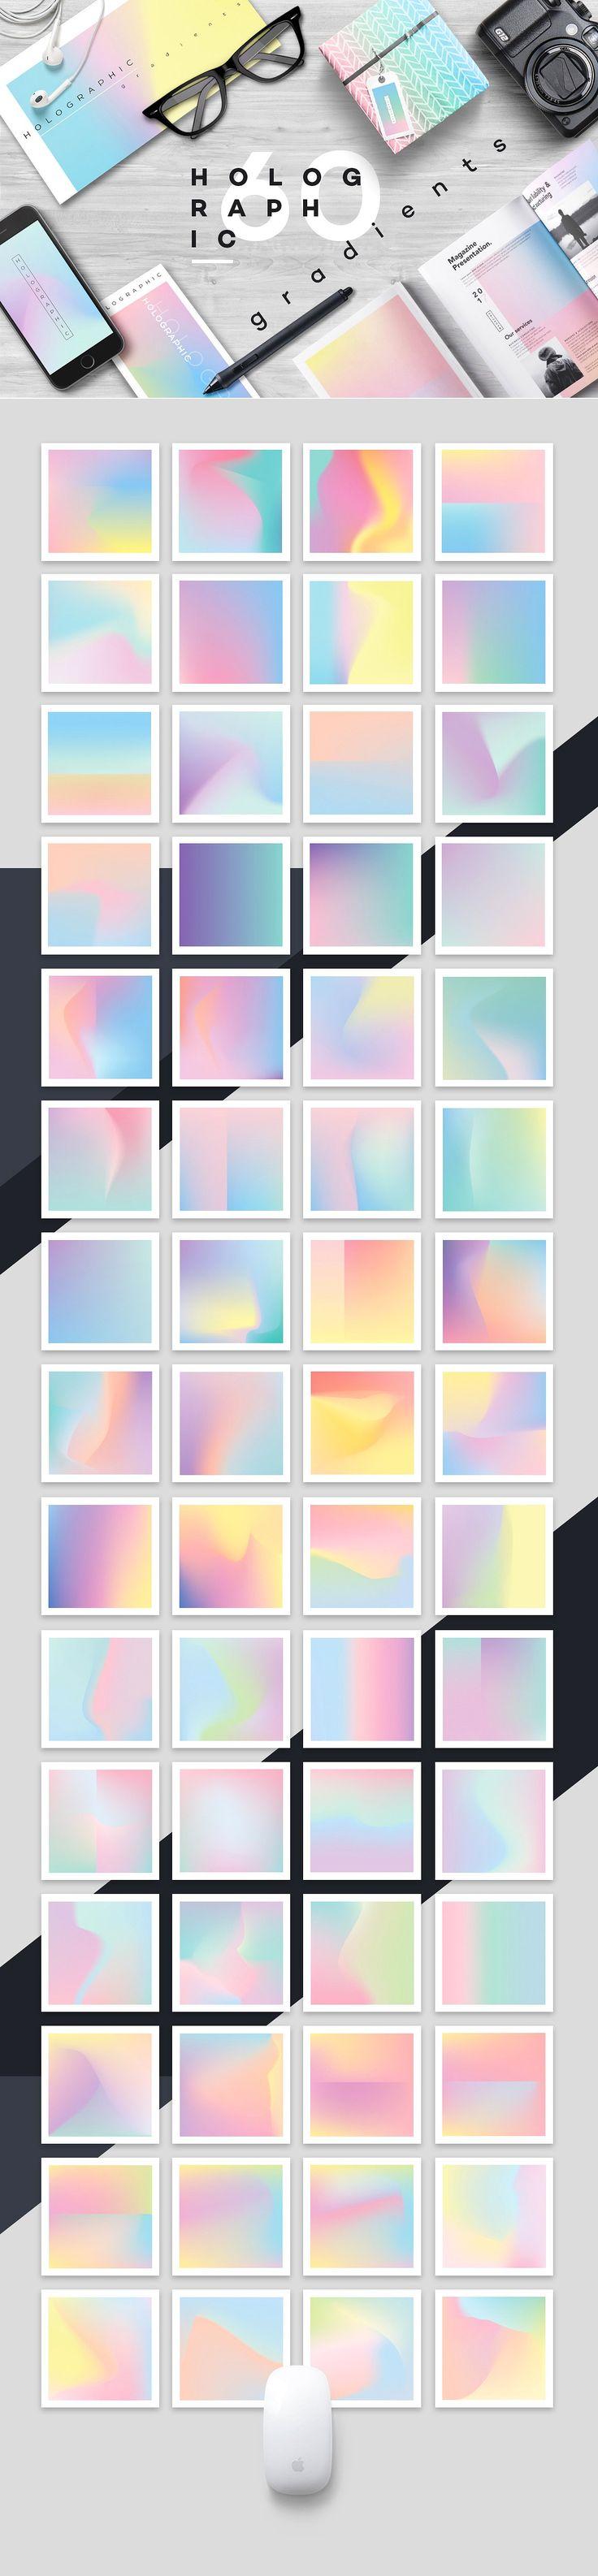 Holographic gradients by Polar Vectors on @creativemarket